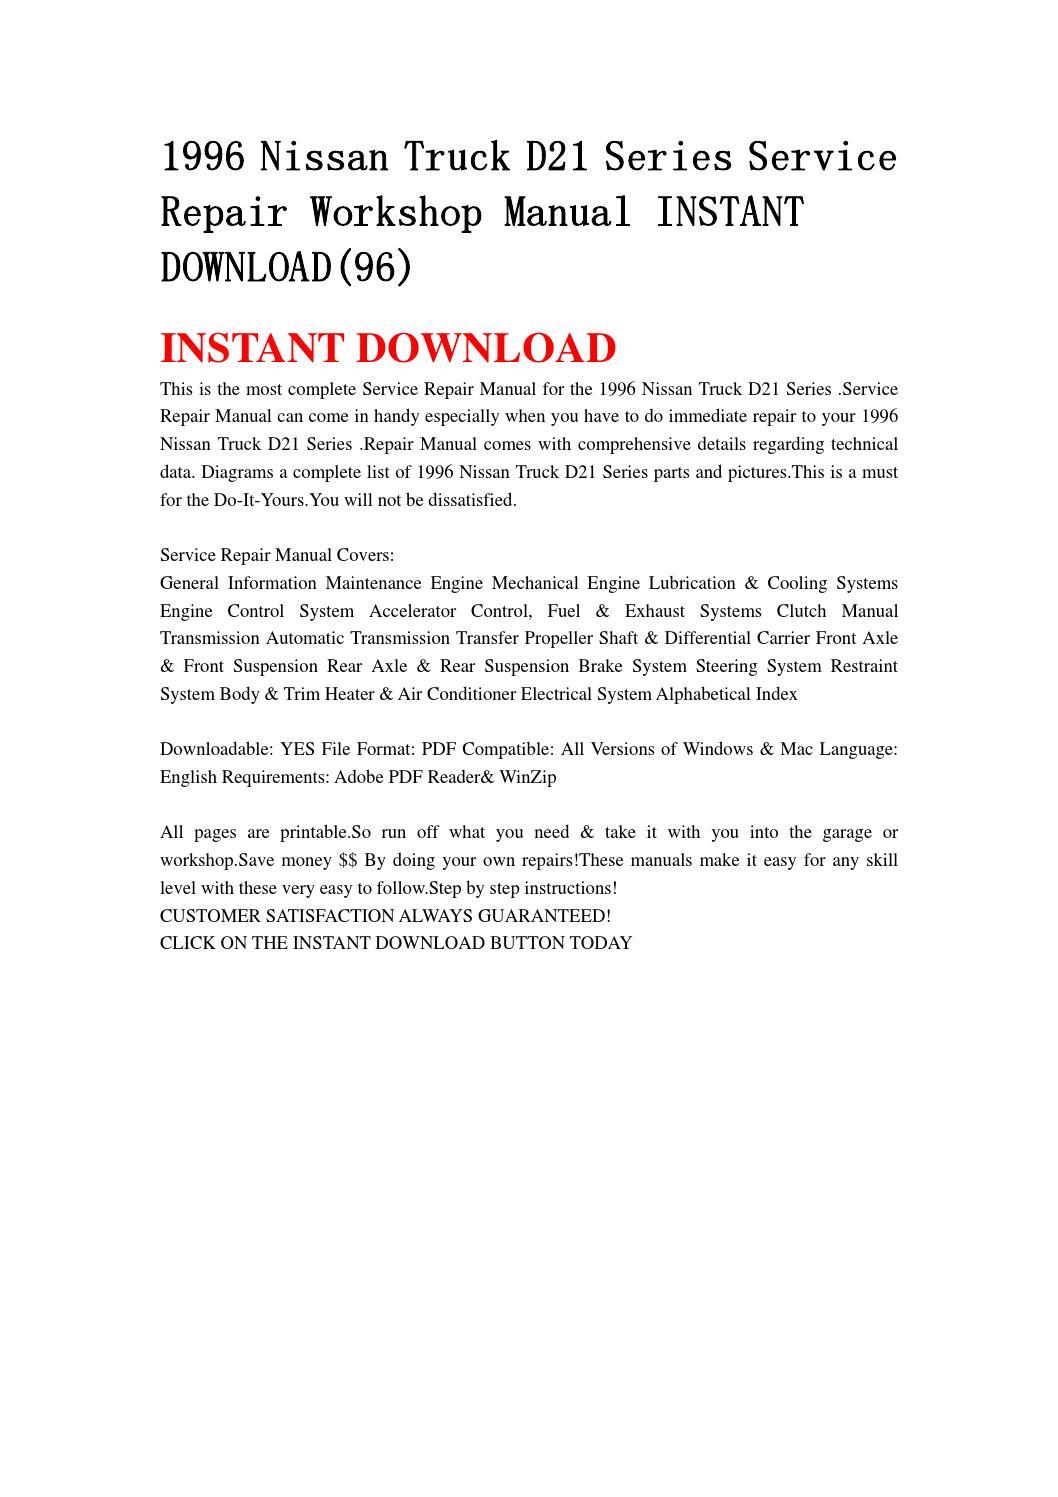 d21 workshop manual